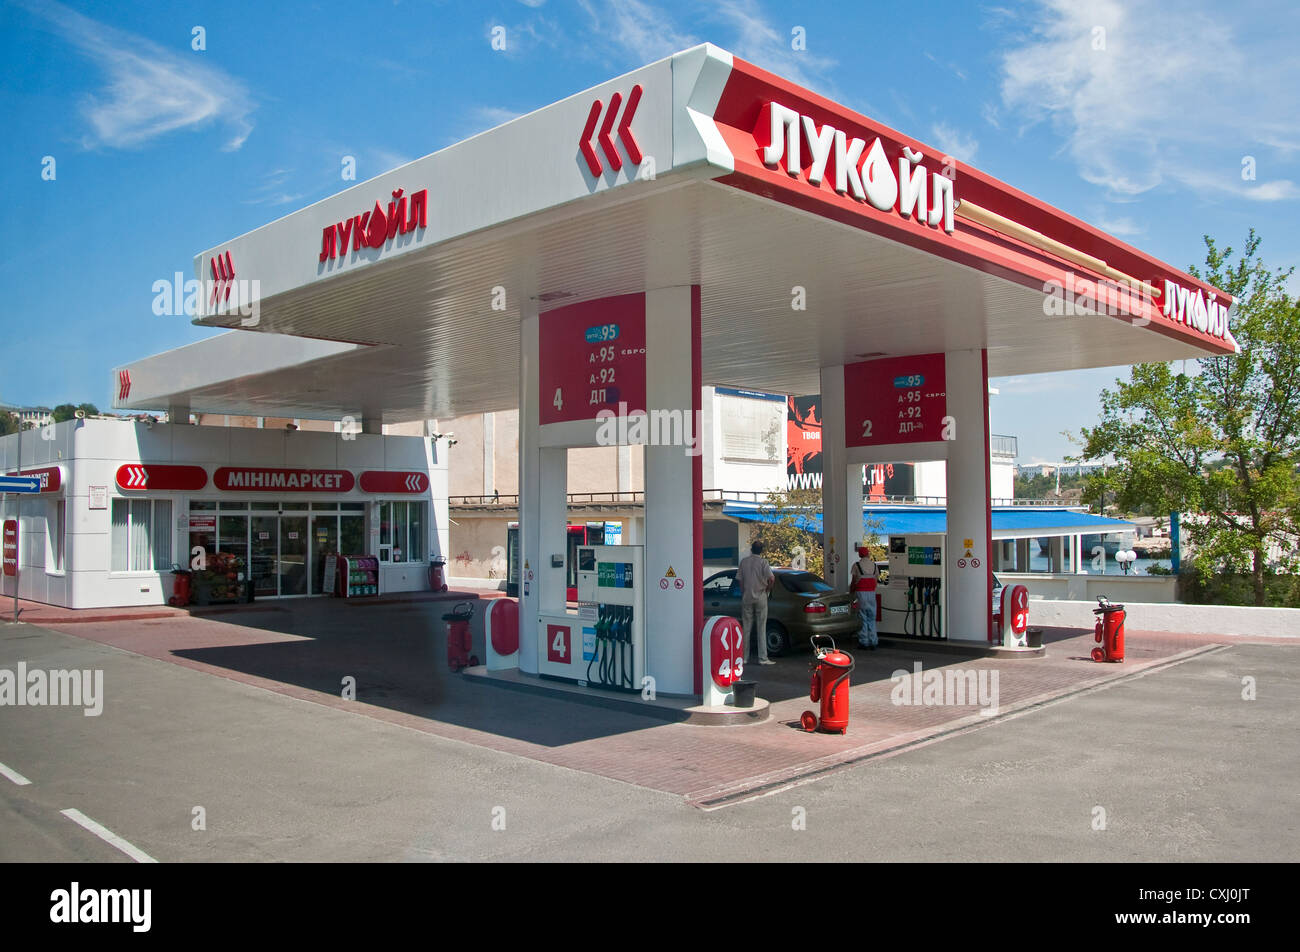 Ukraine petrol station and minimart in Sevastopol - Stock Image